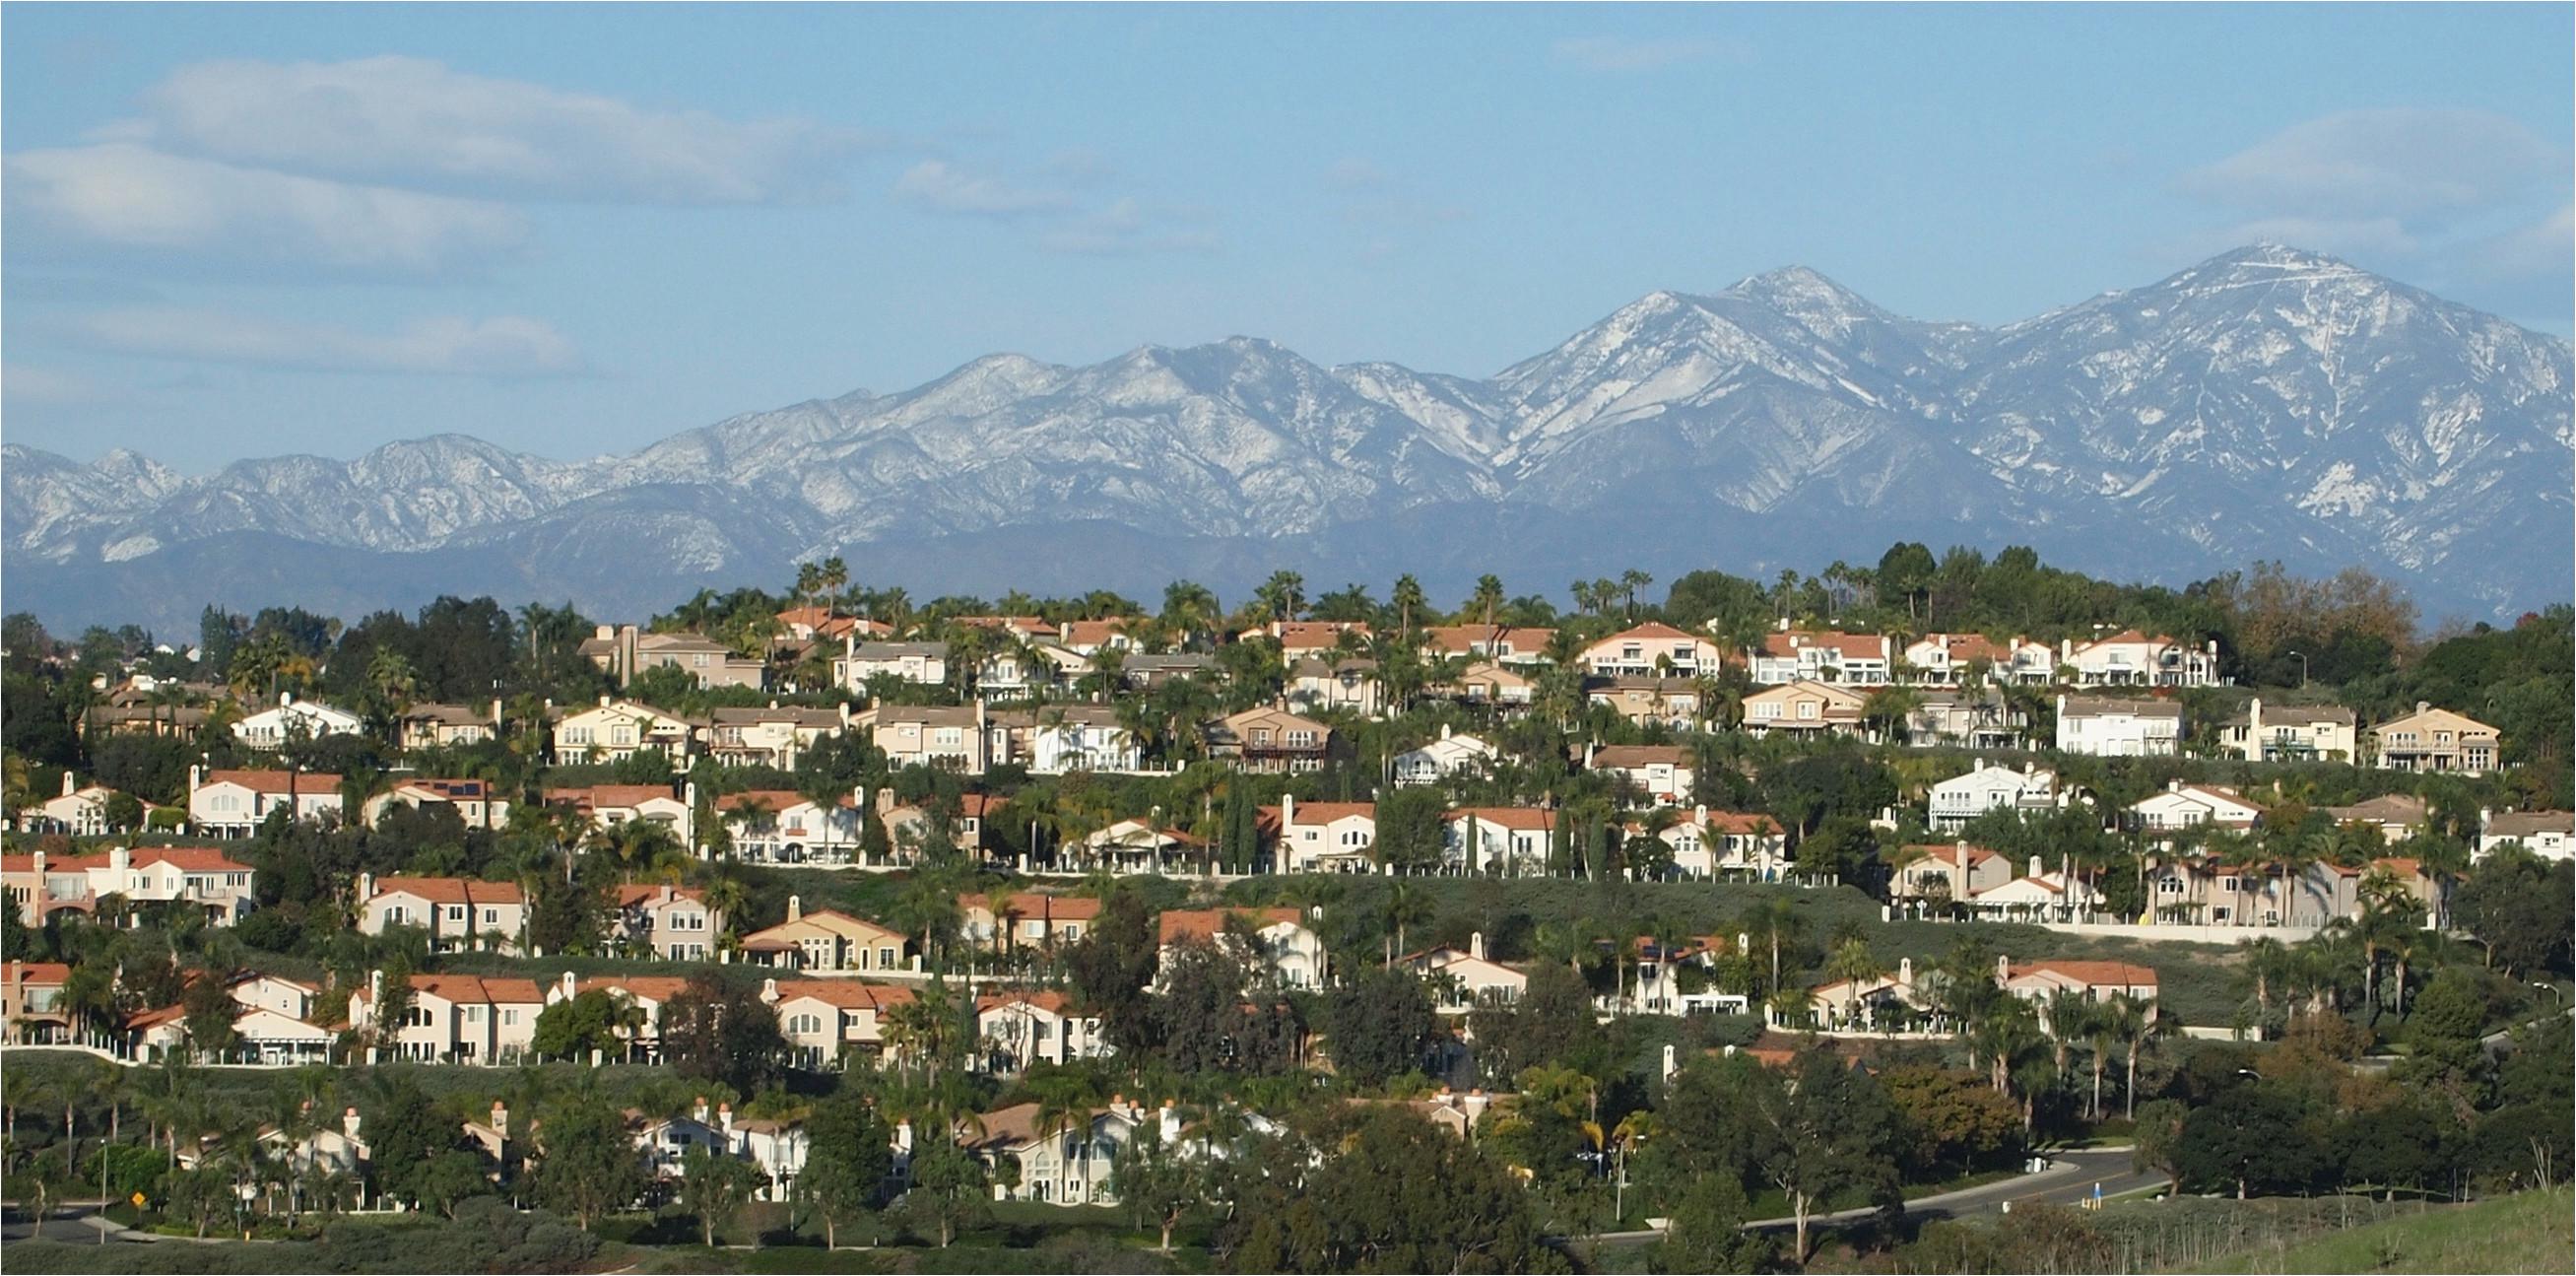 laguna niguel california wikipedia